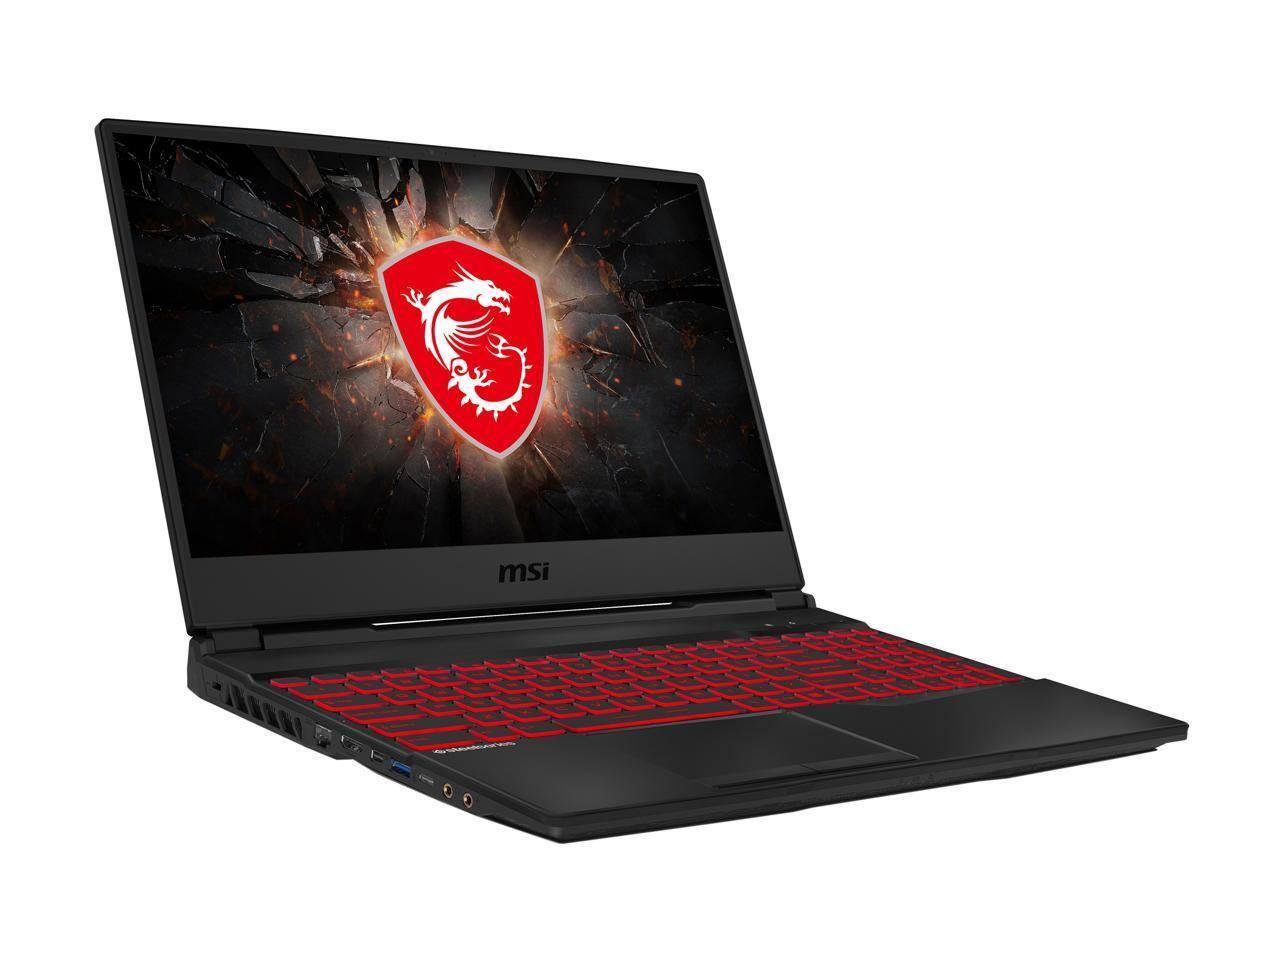 "MSI GL65 Leopard 10SCSR-070 - 15.6"" 144 Hz - Intel Core i7-10750H - GeForce GTX 1650 Ti - 8 GB Memory - 512GB SSD - Windows 10 Home - Gaming Laptop $799 AR"